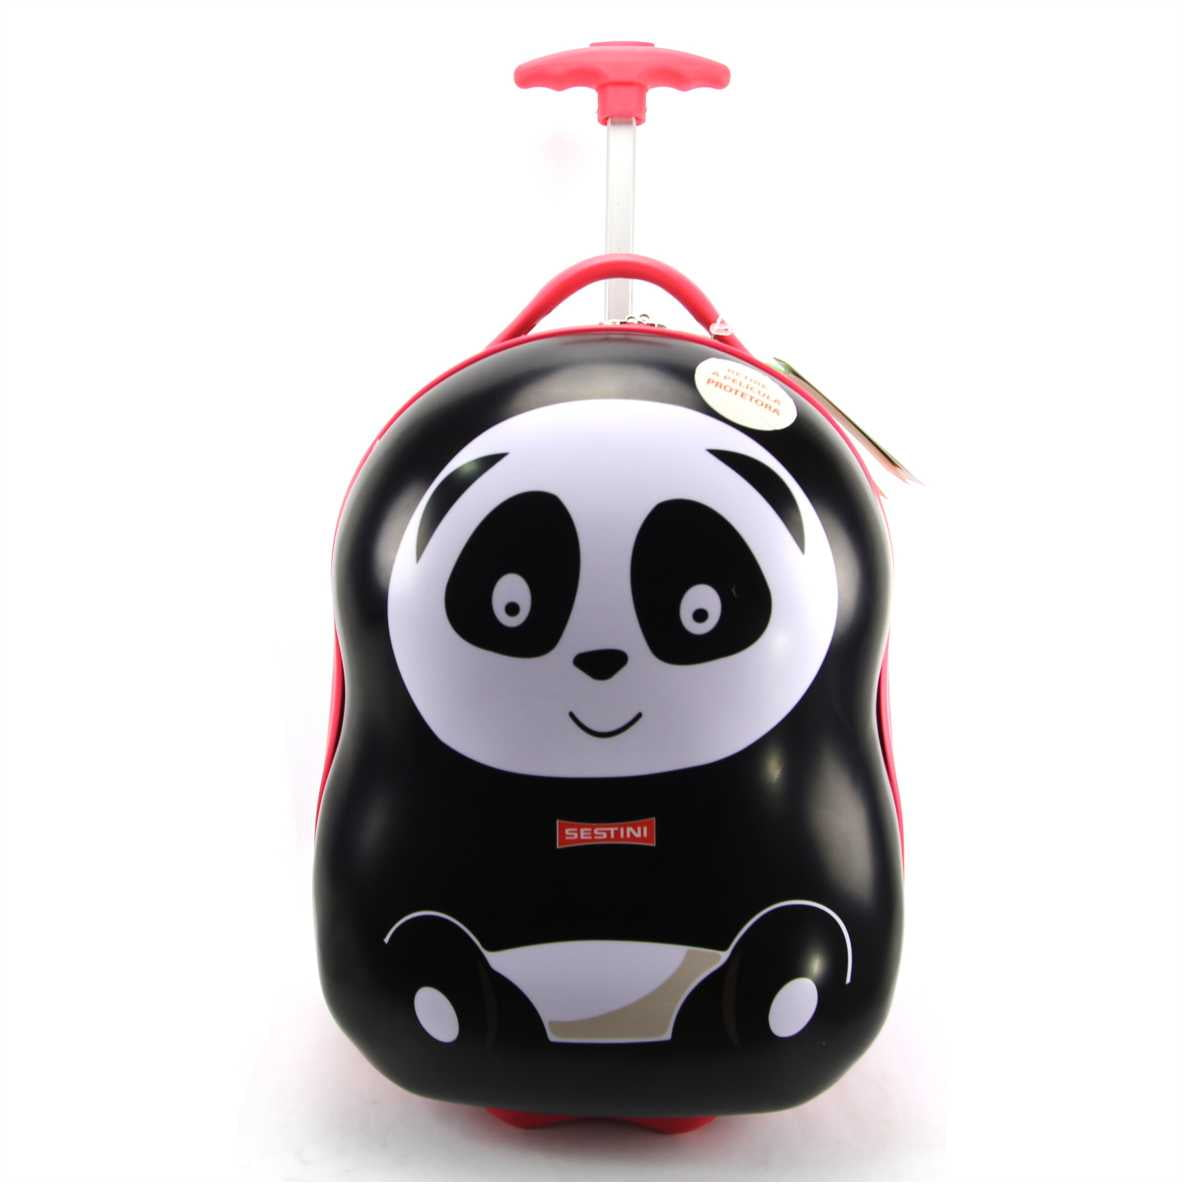 Malinha Infantil Pequena Panda Escolar Sestini 065647